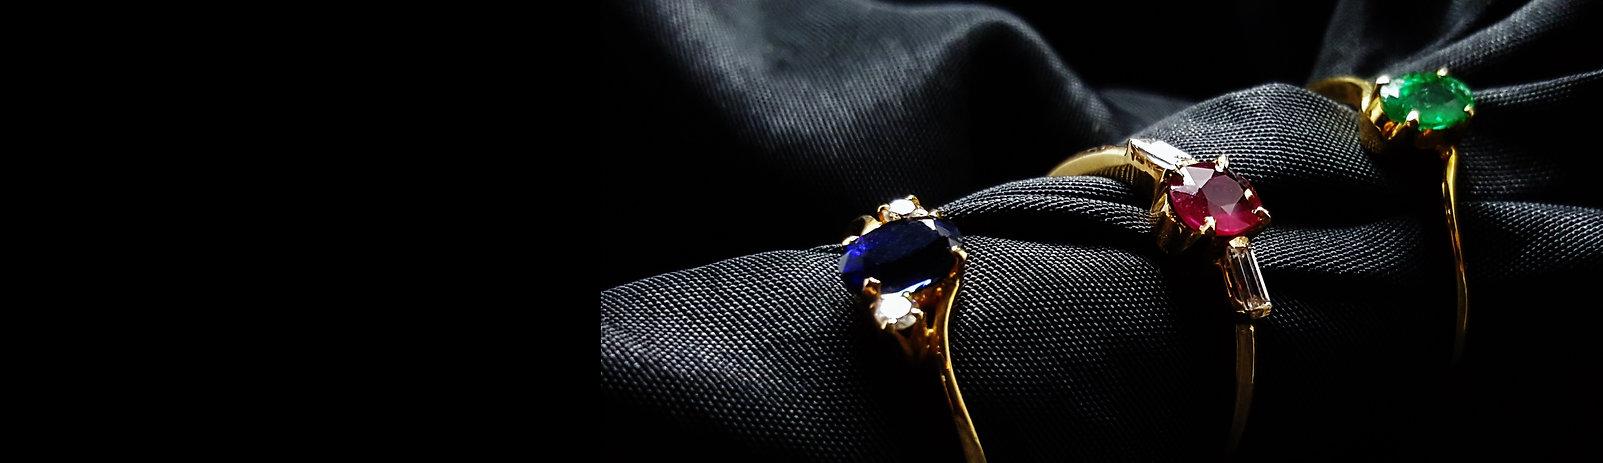 Gemory Design Erlangen, Edelstein Ring, Saphir Ring, Rubin Ring, Smaragd Ring, 18K gold Ring Damen